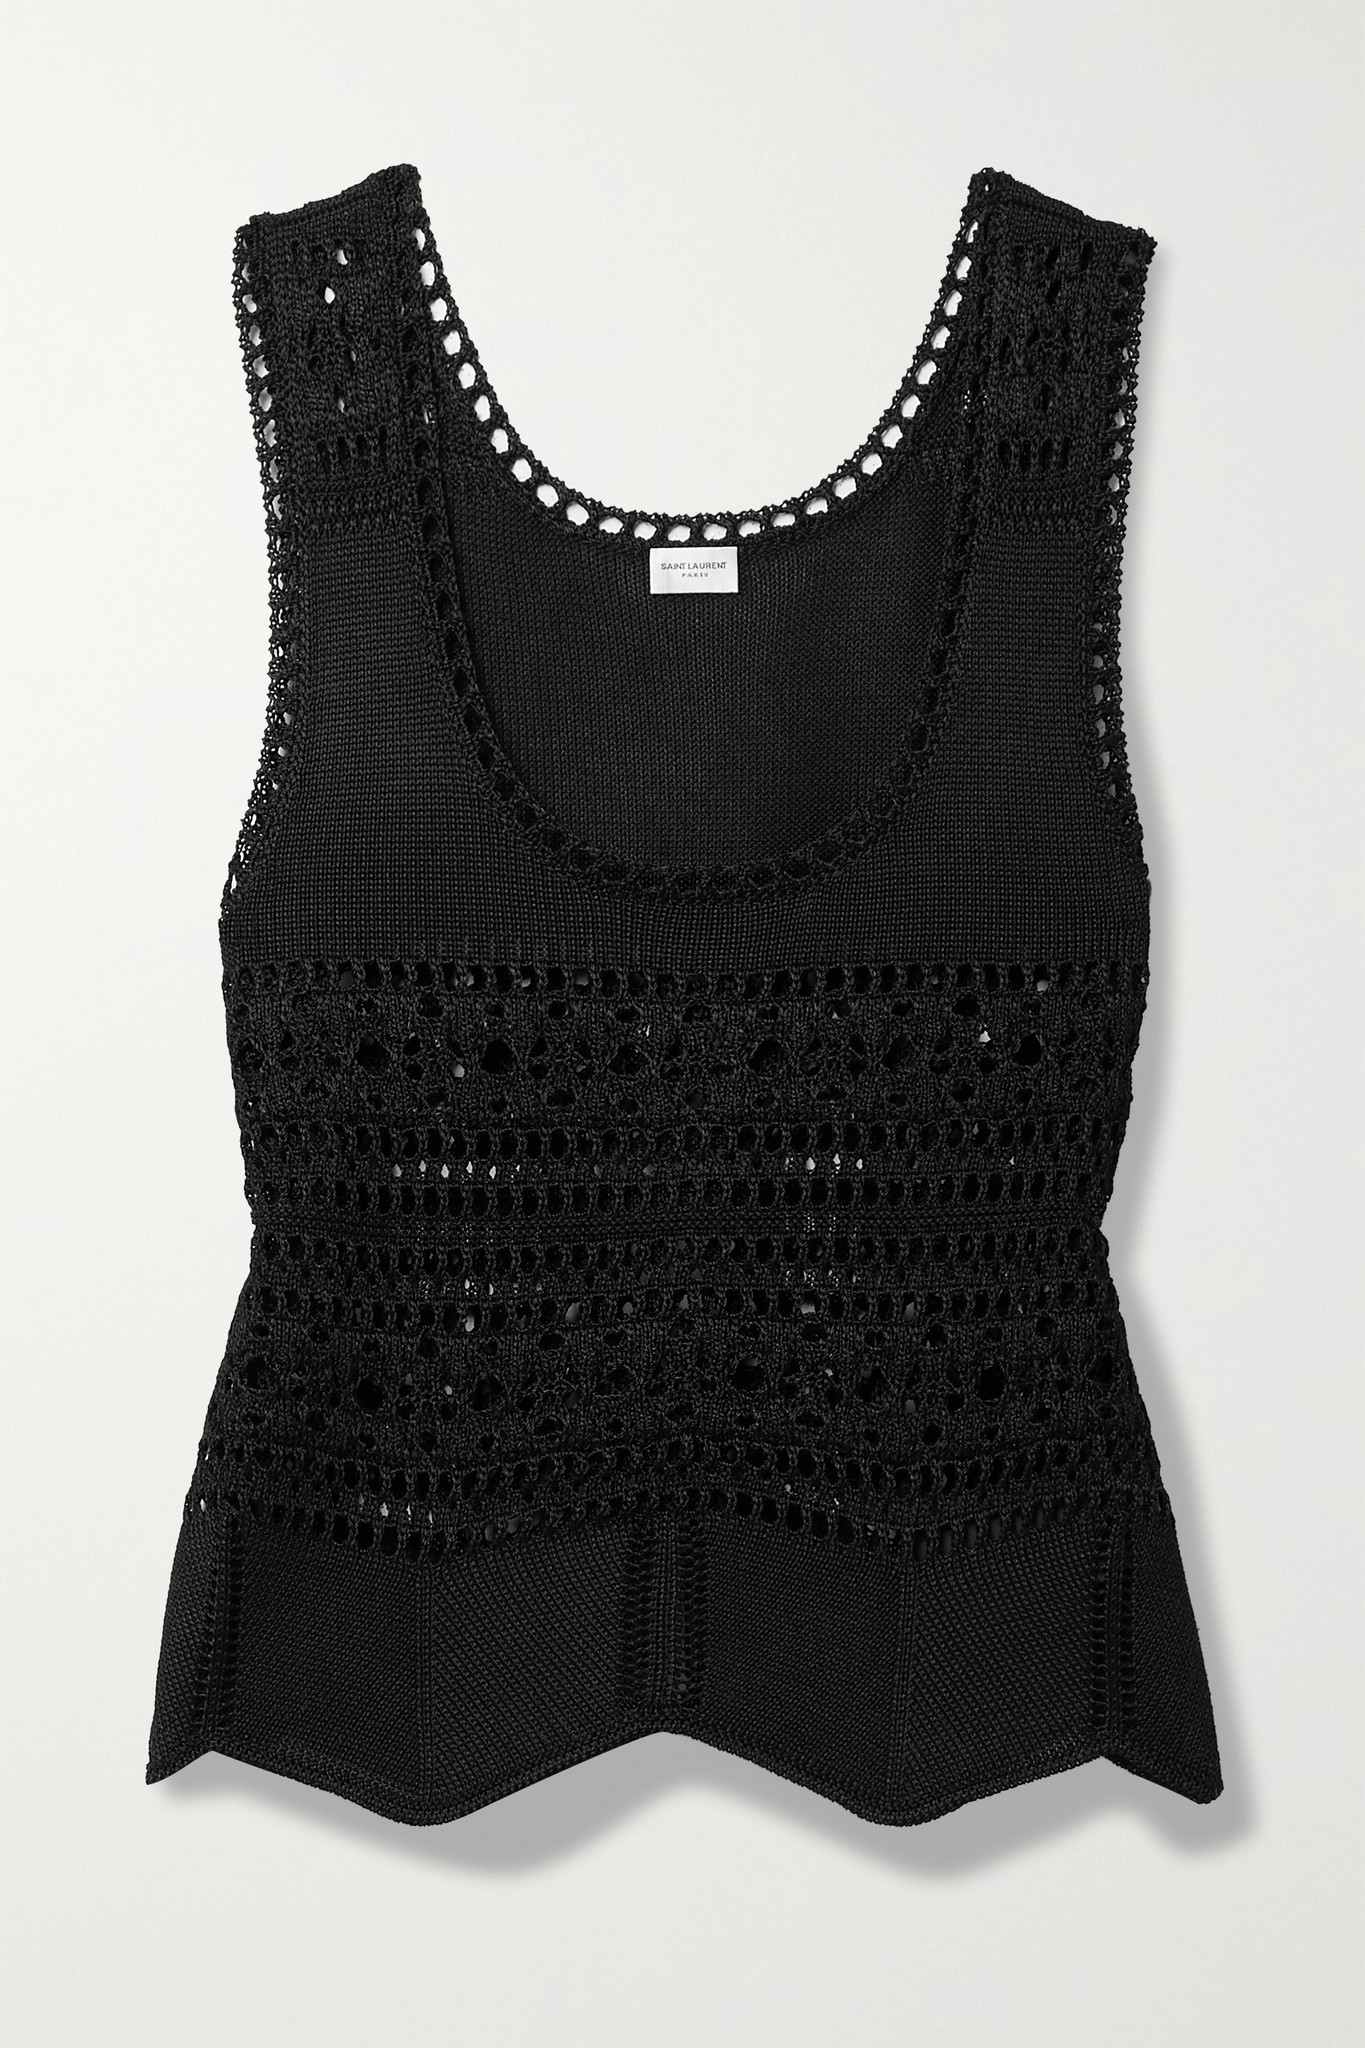 SAINT LAURENT - Crochet-knit Tank - Black - medium